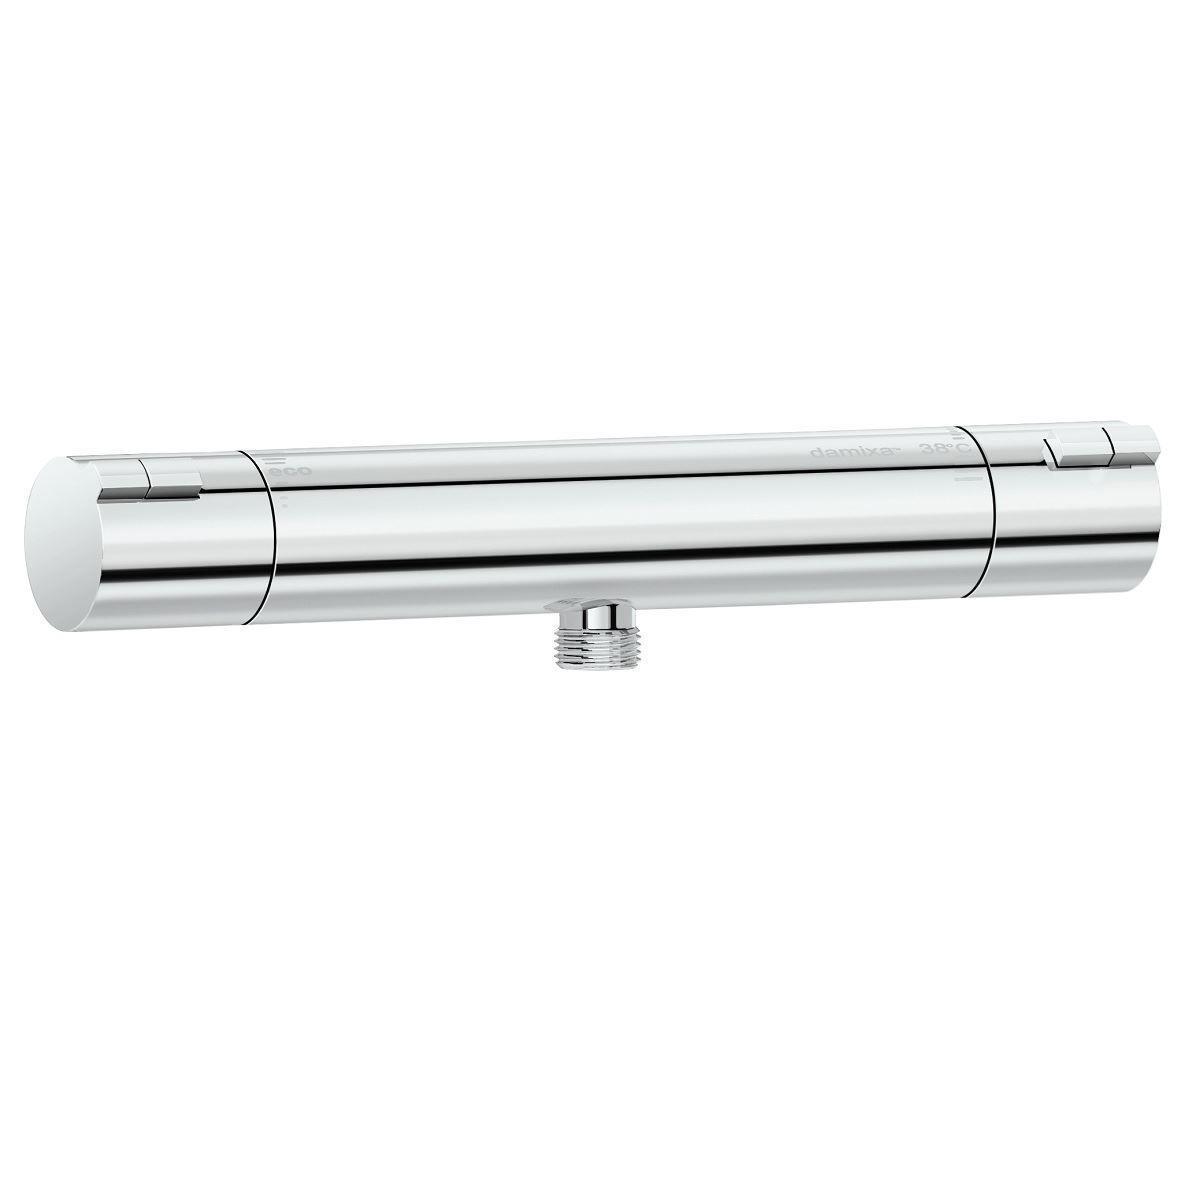 Dusjkraner dusjtermostat dusjbatteri Brandbu Hadeland Glass & Vaktmesterservice AS